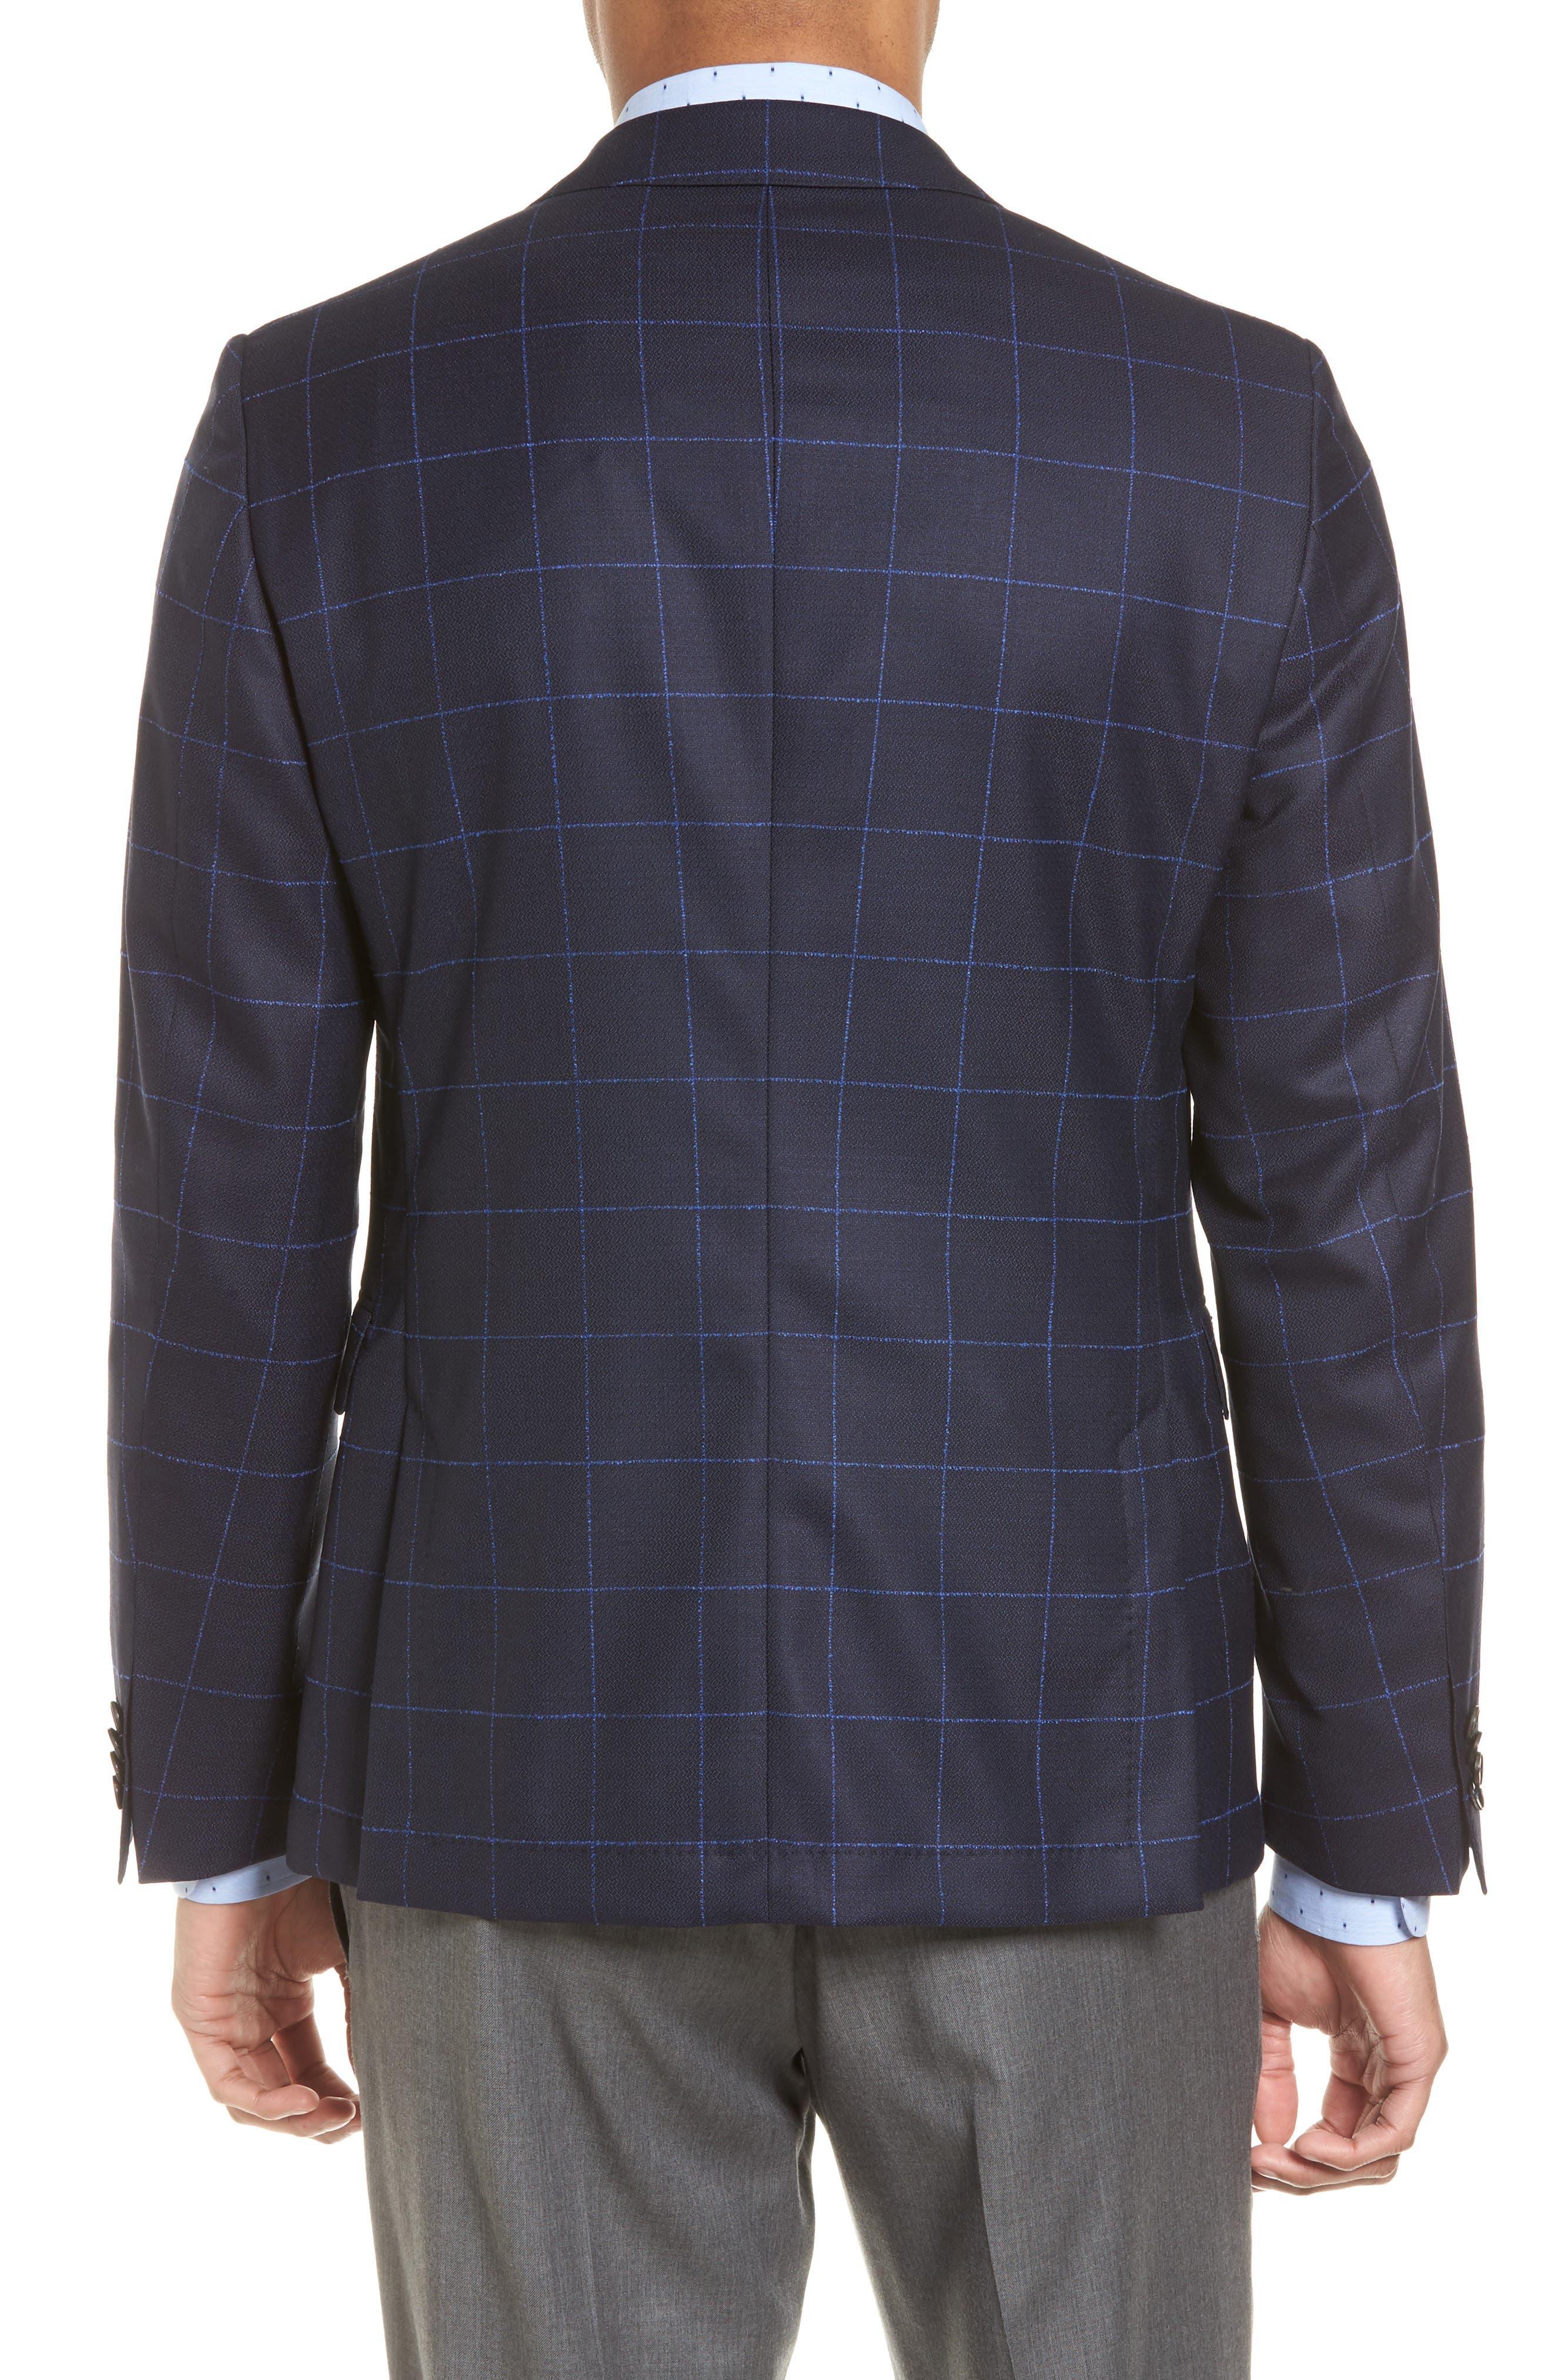 Nordstrom x BOSS Nobis Trim Fit Check Wool Sport Coat,                             Alternate thumbnail 2, color,                             410